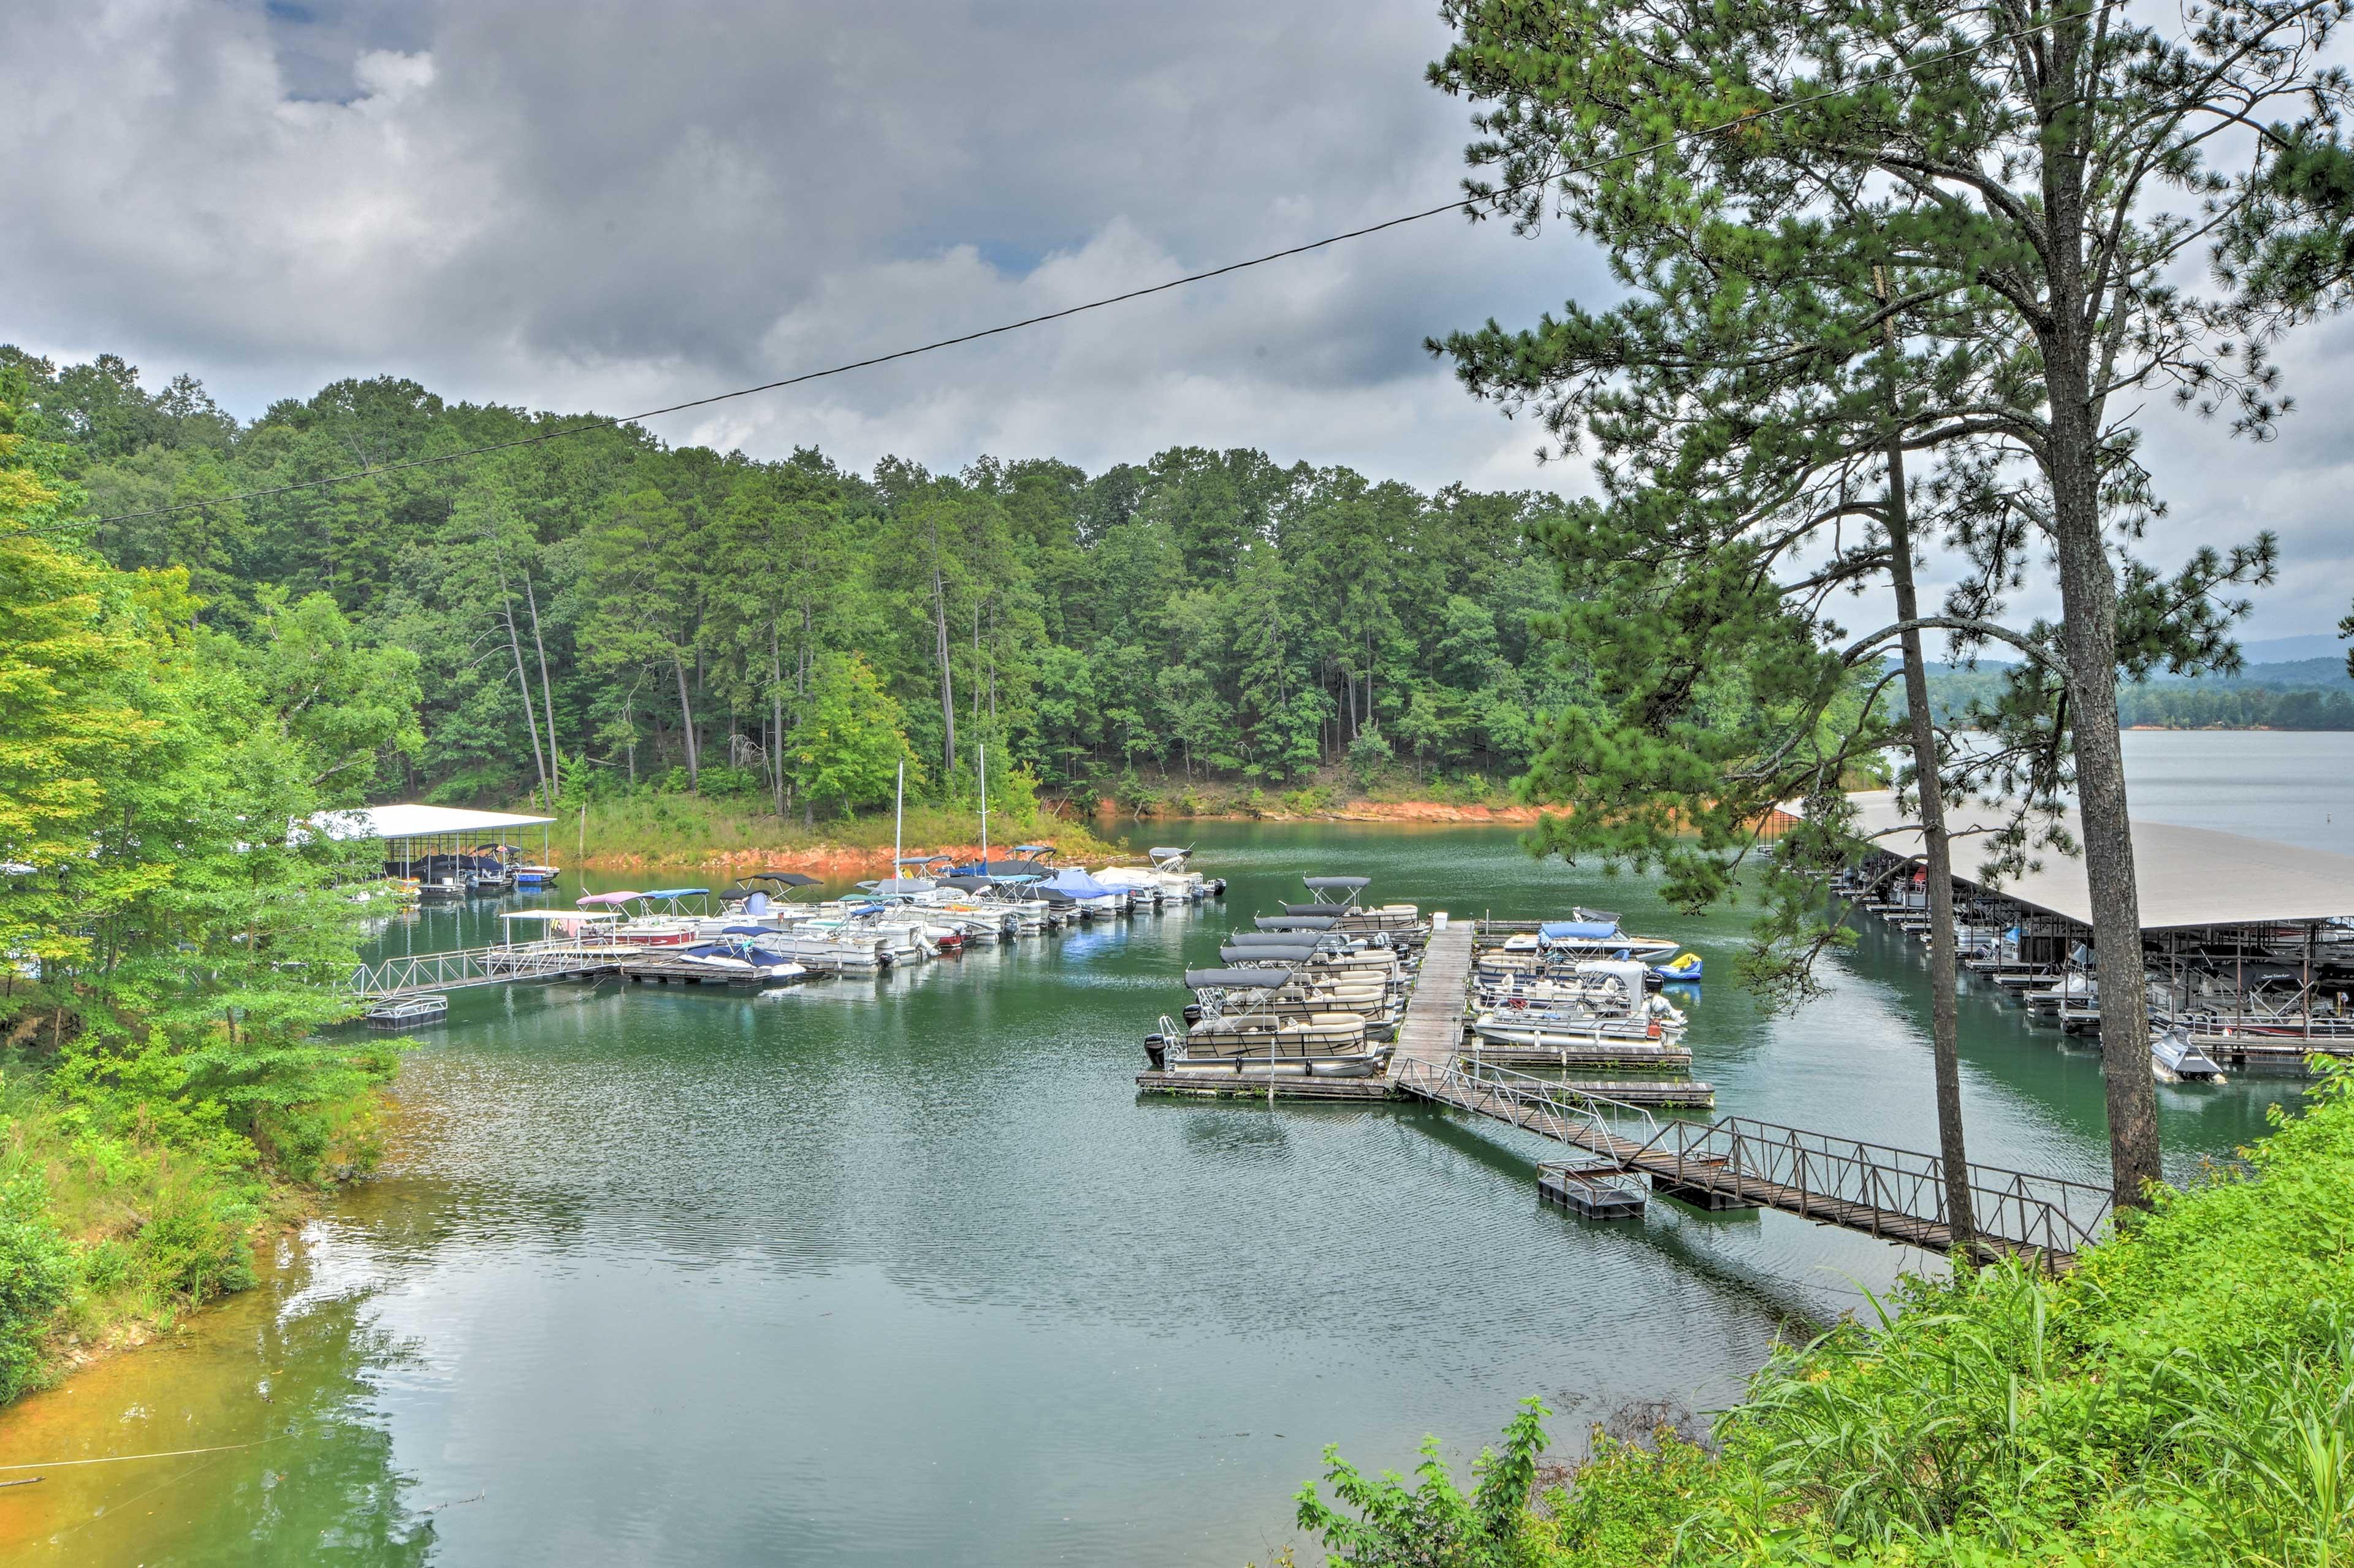 Carters Lake Marina & Resort is just over 12 miles away!